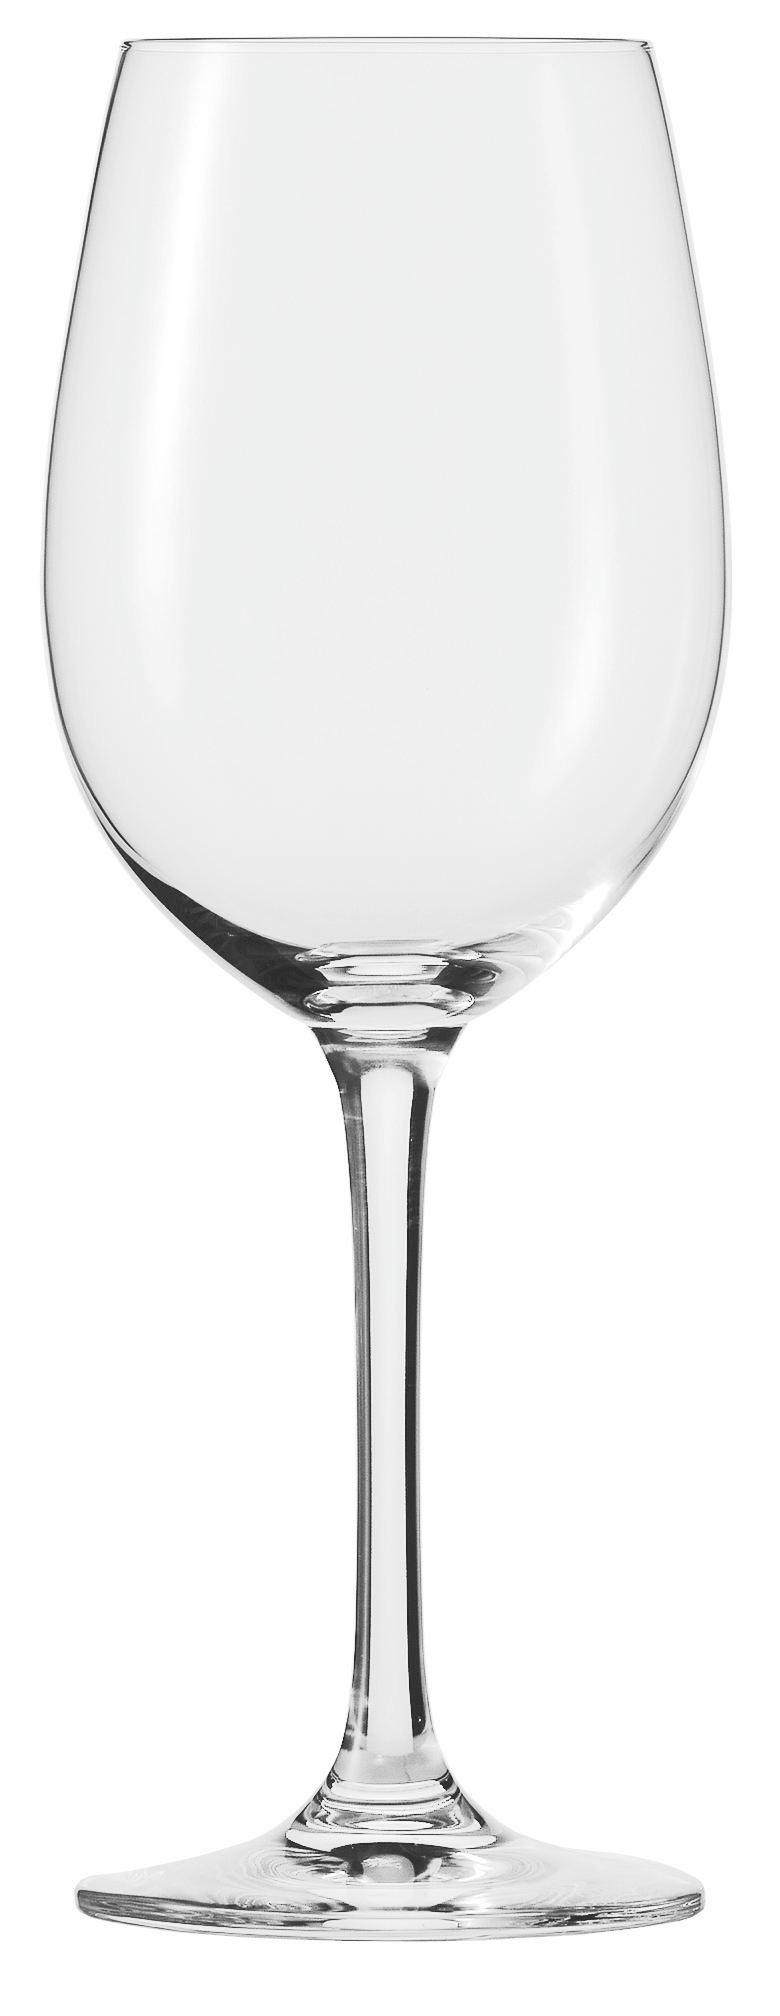 ROTWEINGLAS - Klar, Basics, Glas (0,545l) - SCHOTT ZWIESEL